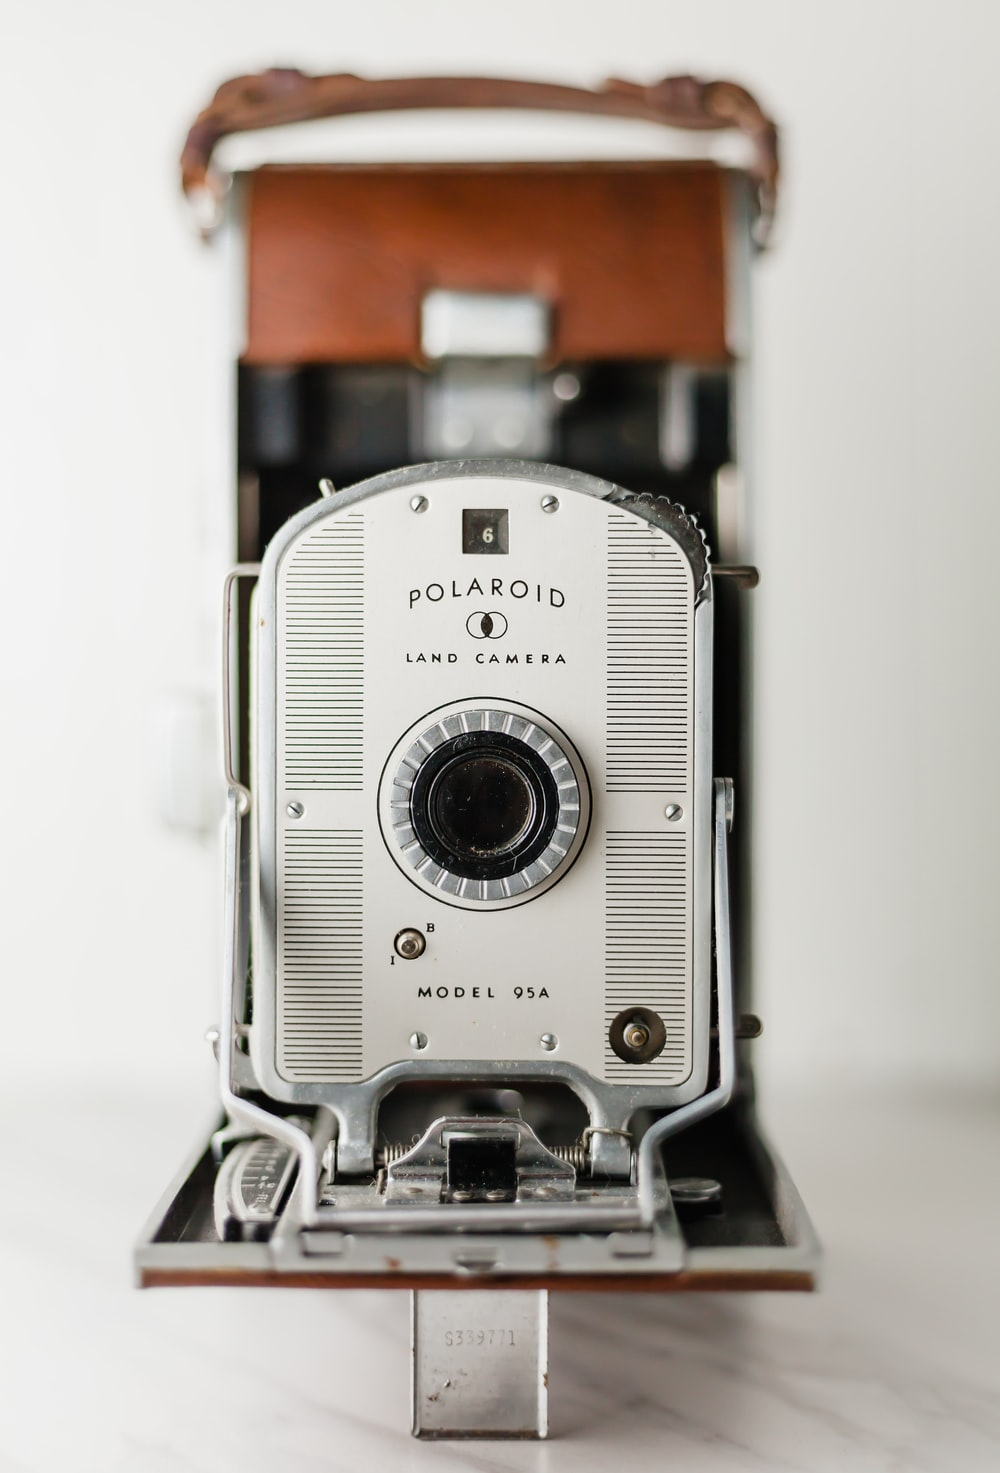 silver and brown Polaroid land camera